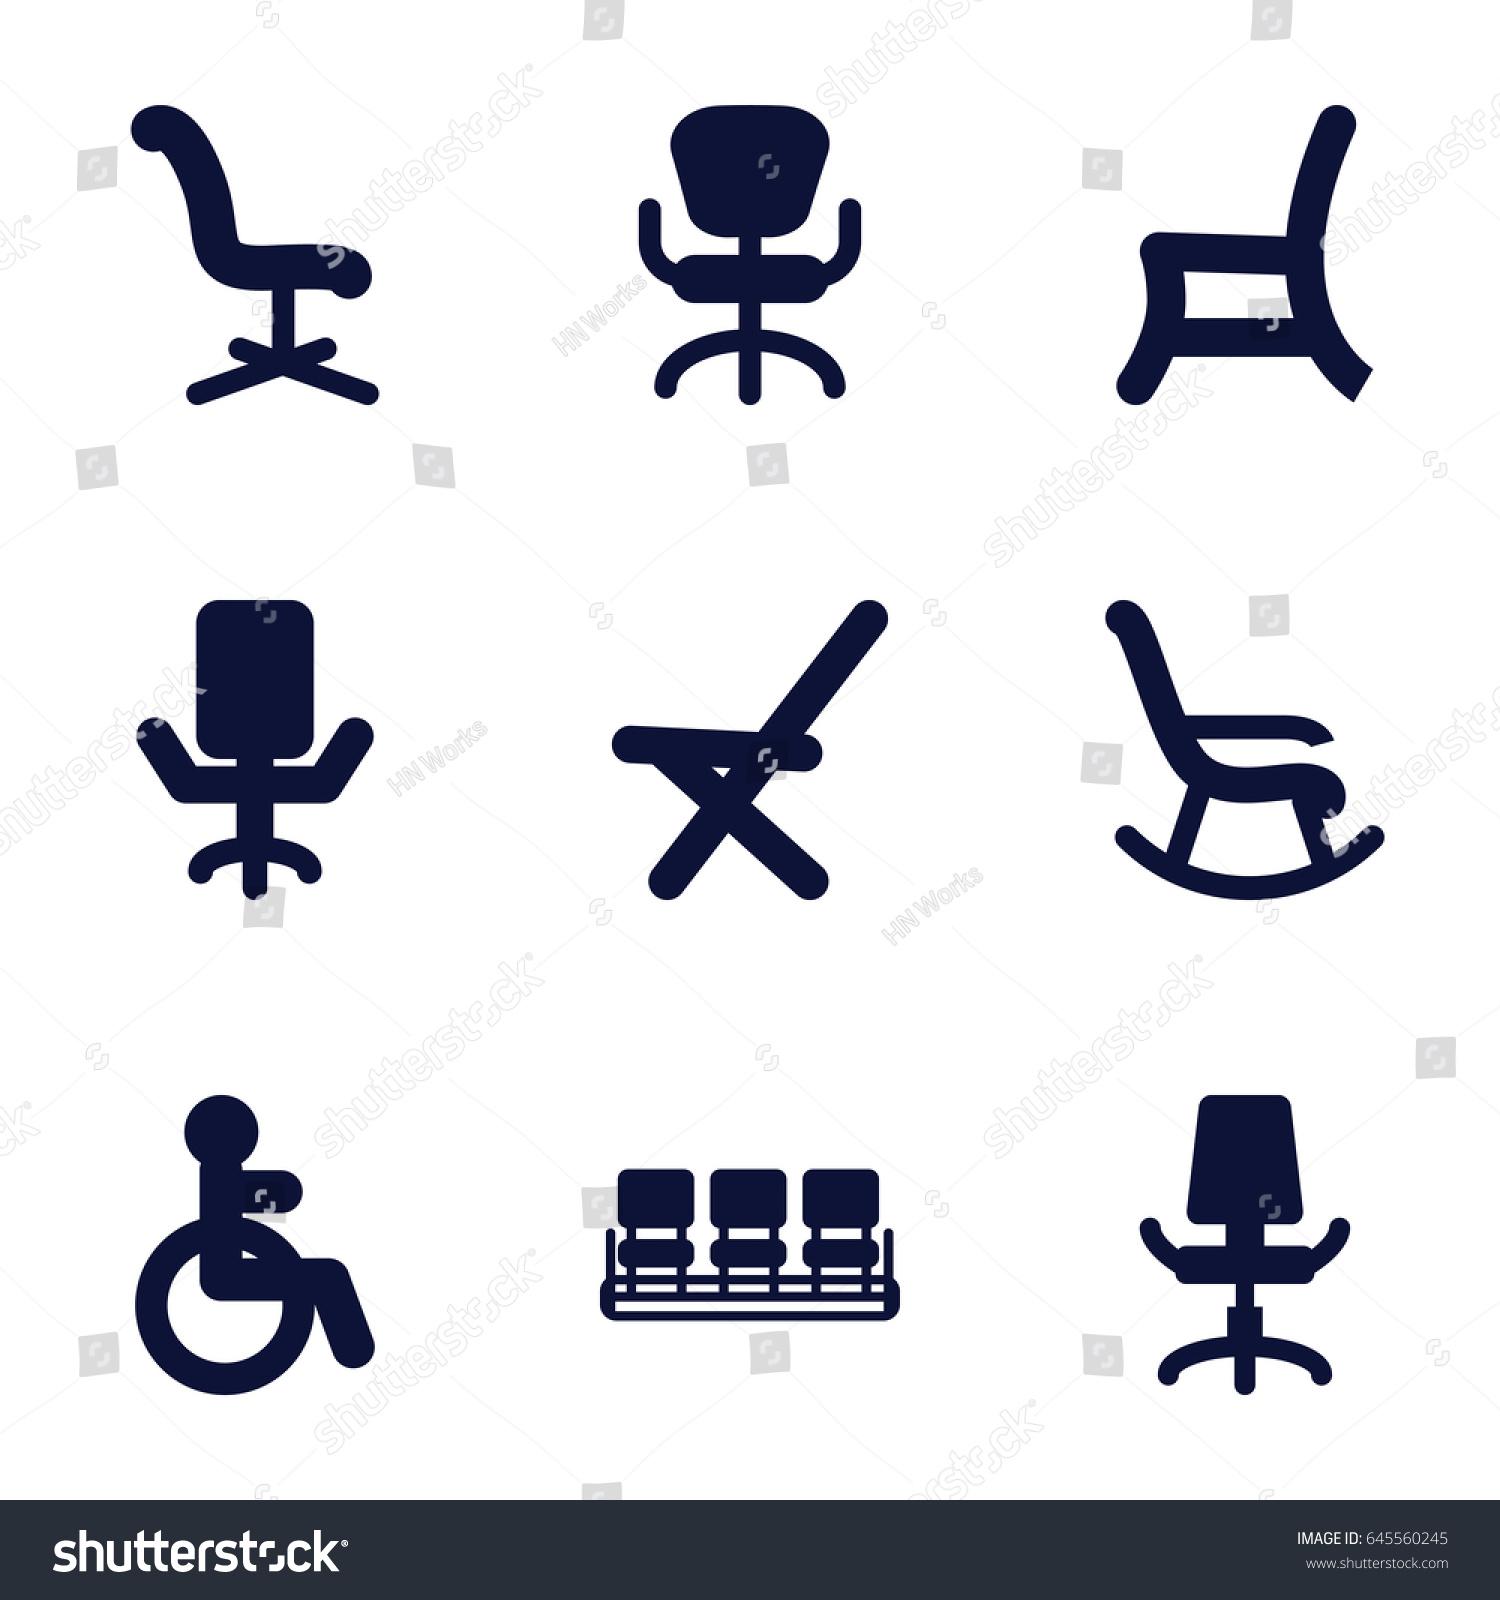 Armchair Icons Set Set 9 Armchair Stock Vector 645560245 - Shutterstock